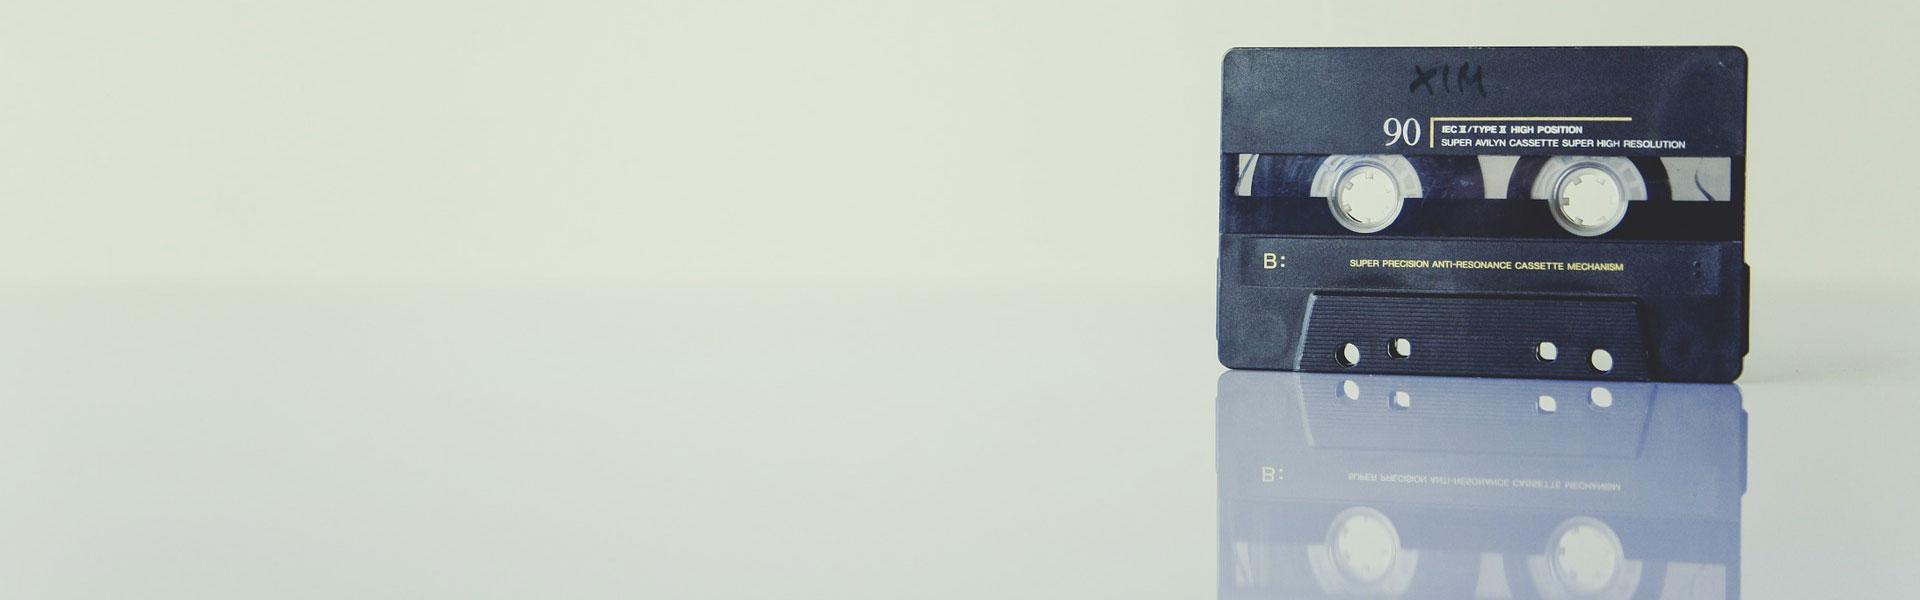 cassette tape - rehyphen header